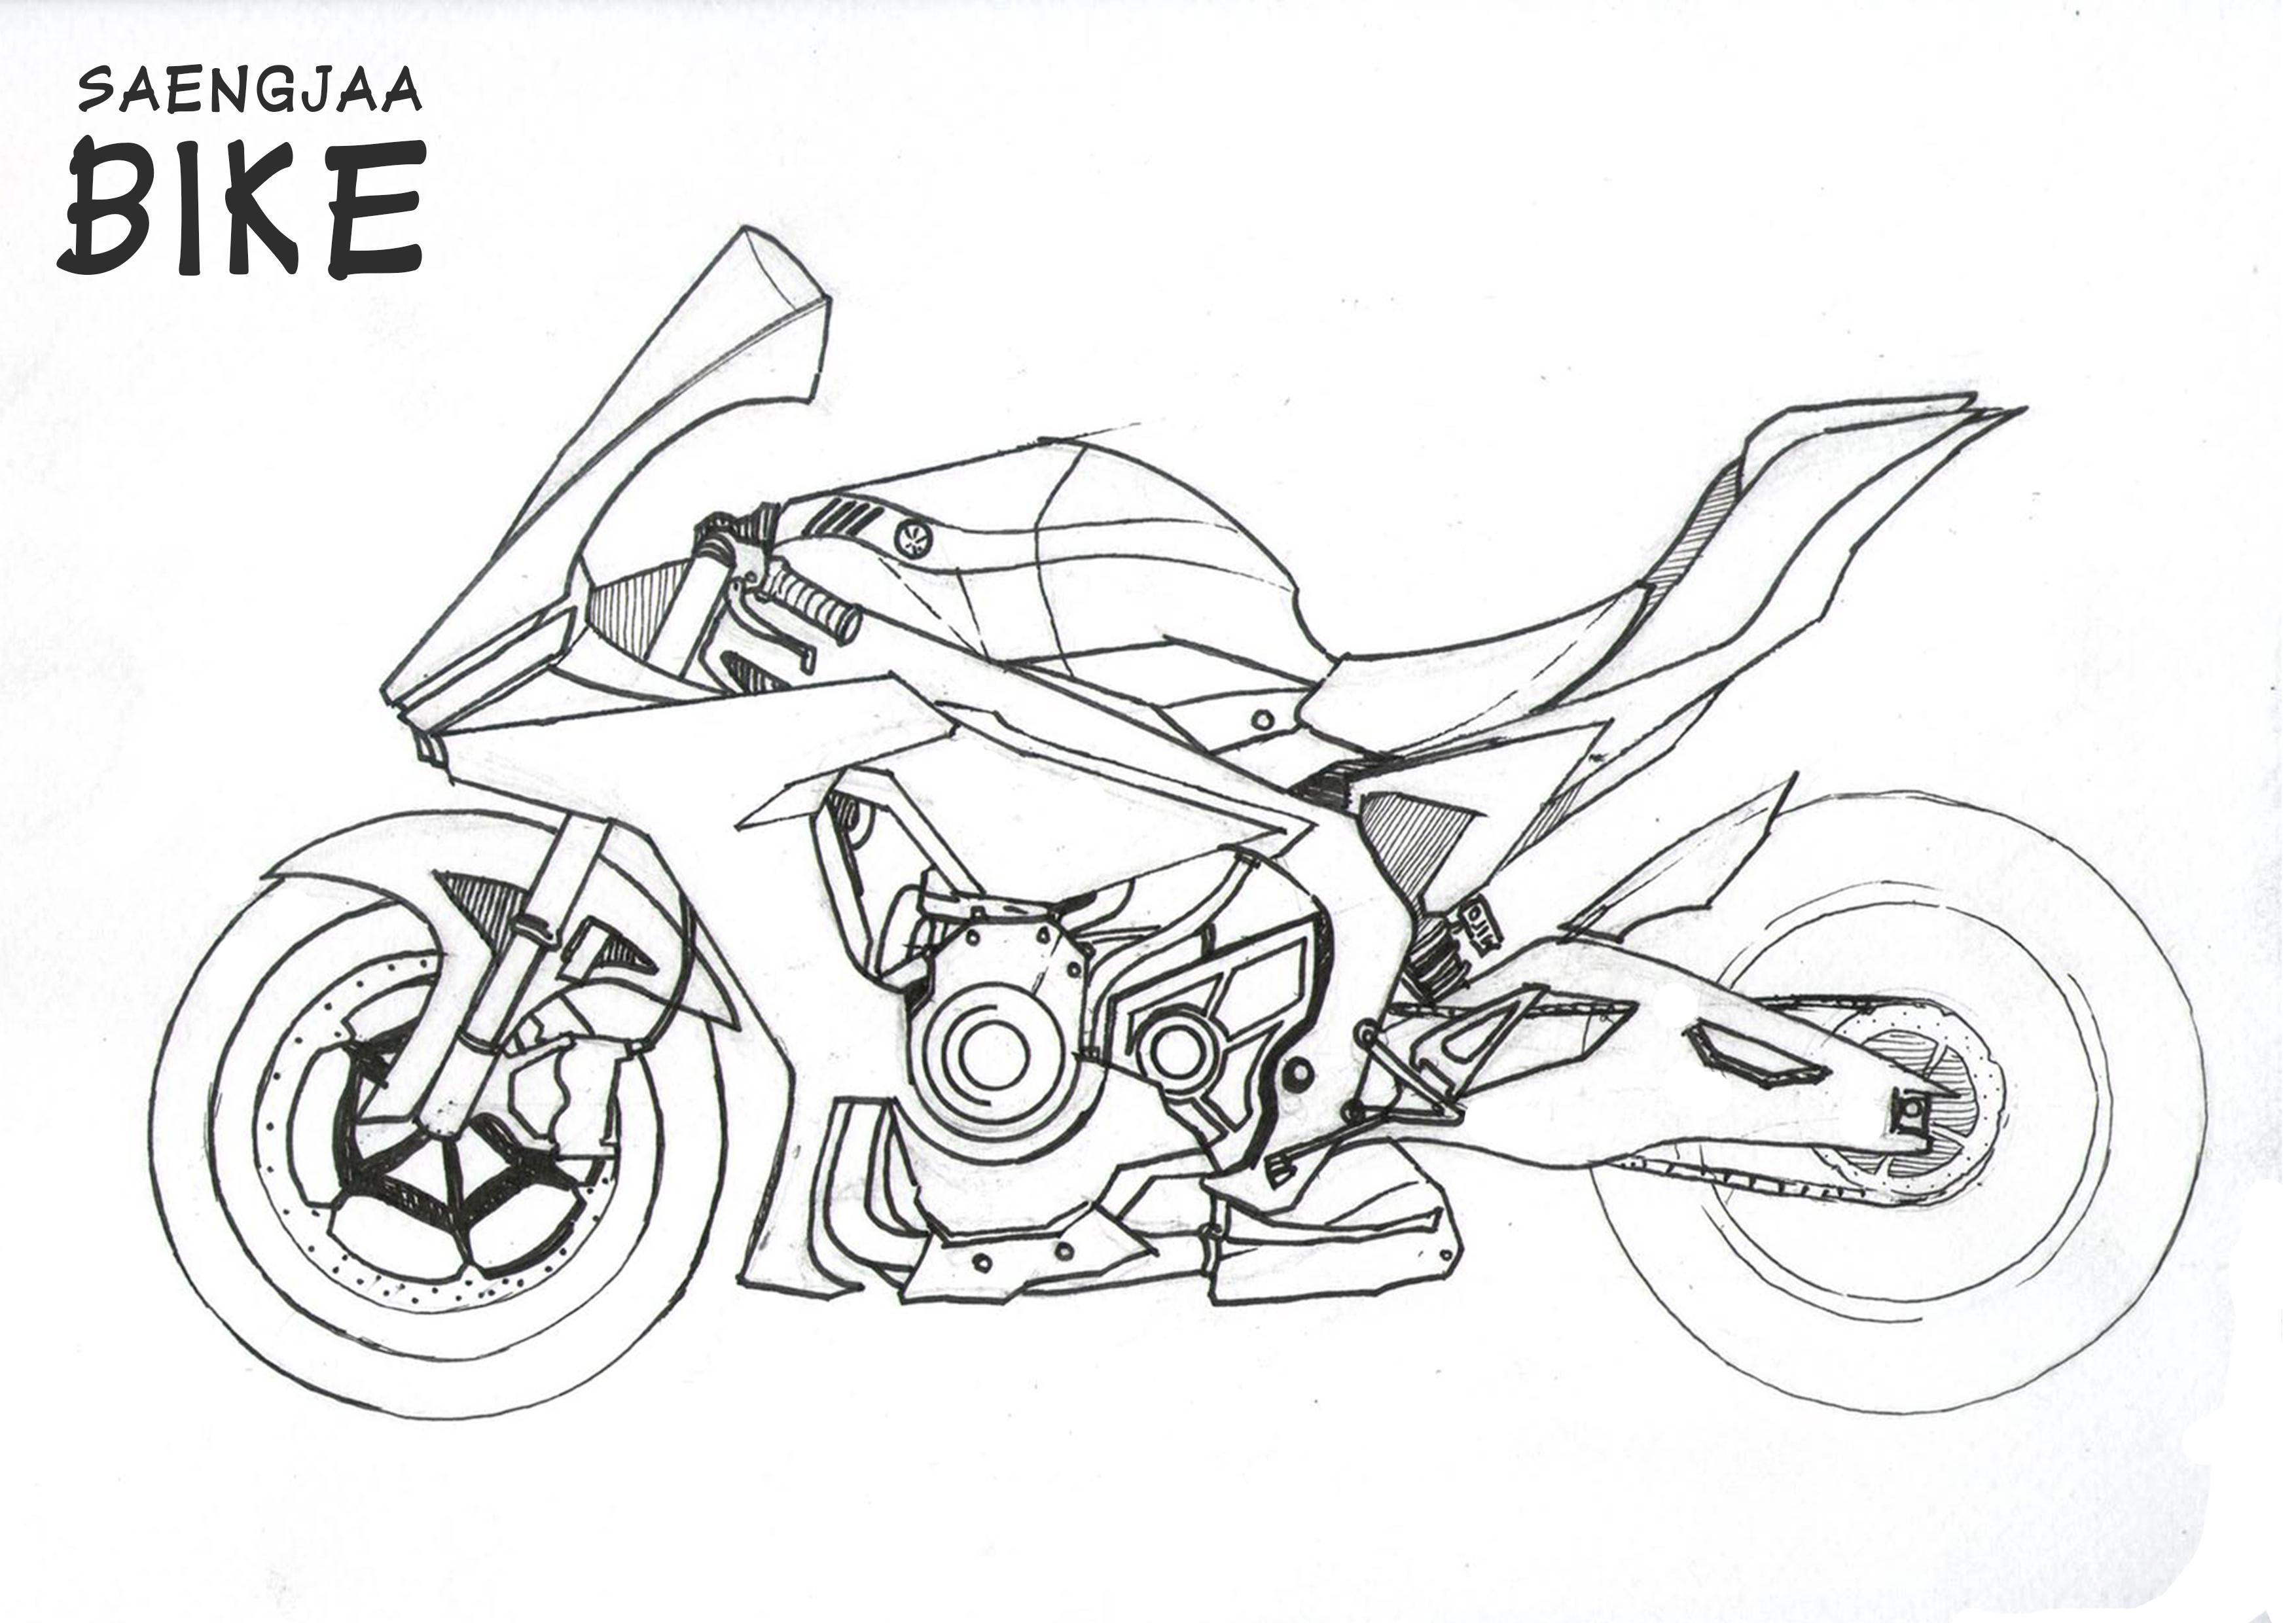 Motorcycle sketch design by Saengjaa